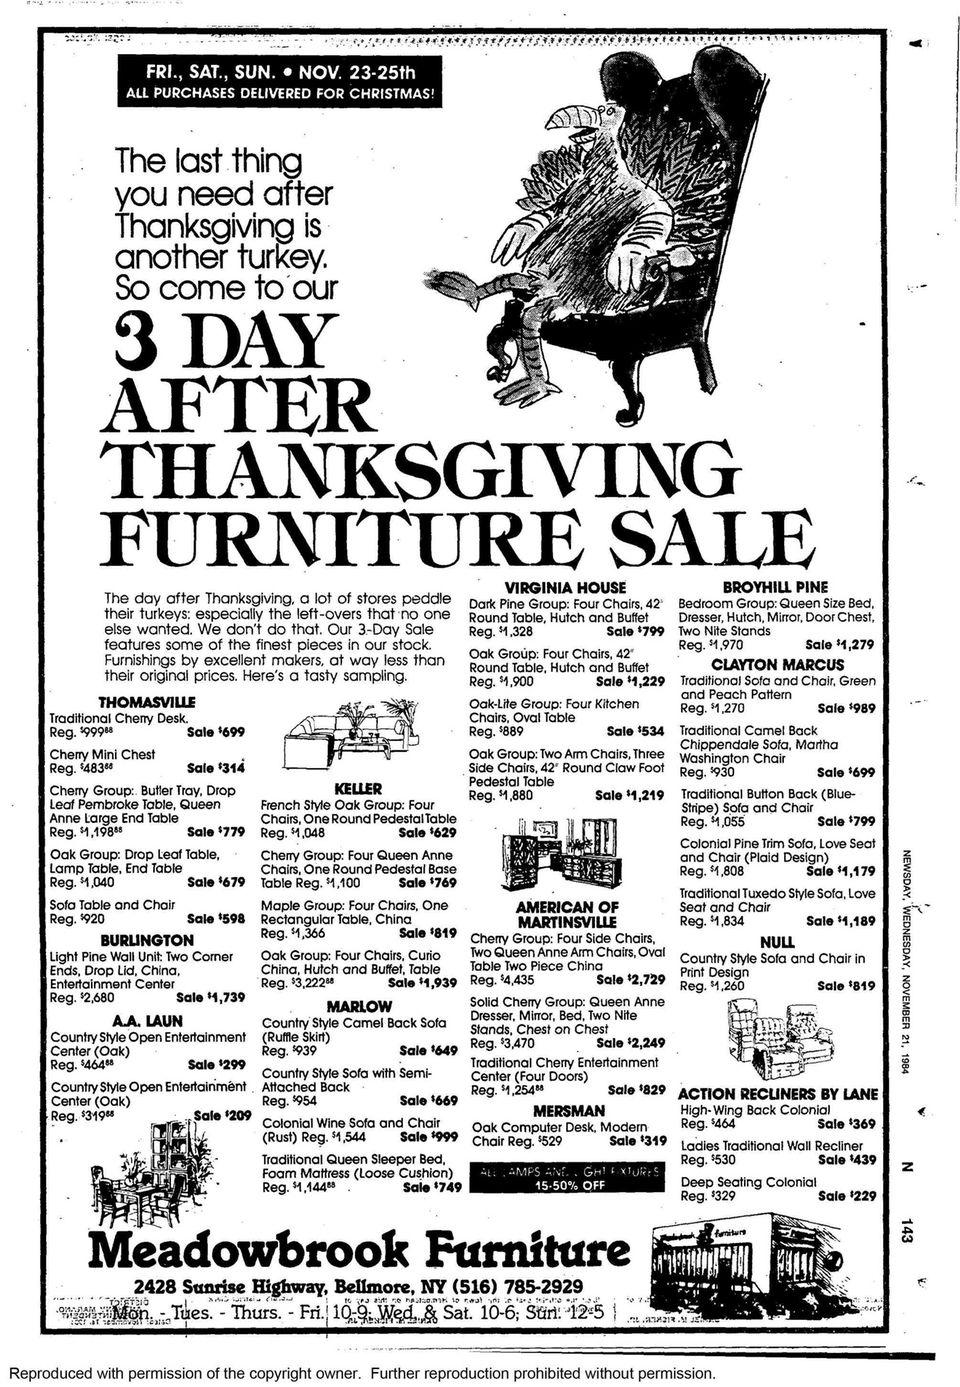 On Nov. 21, 1984, Meadowbrook Furniture in Bellmore